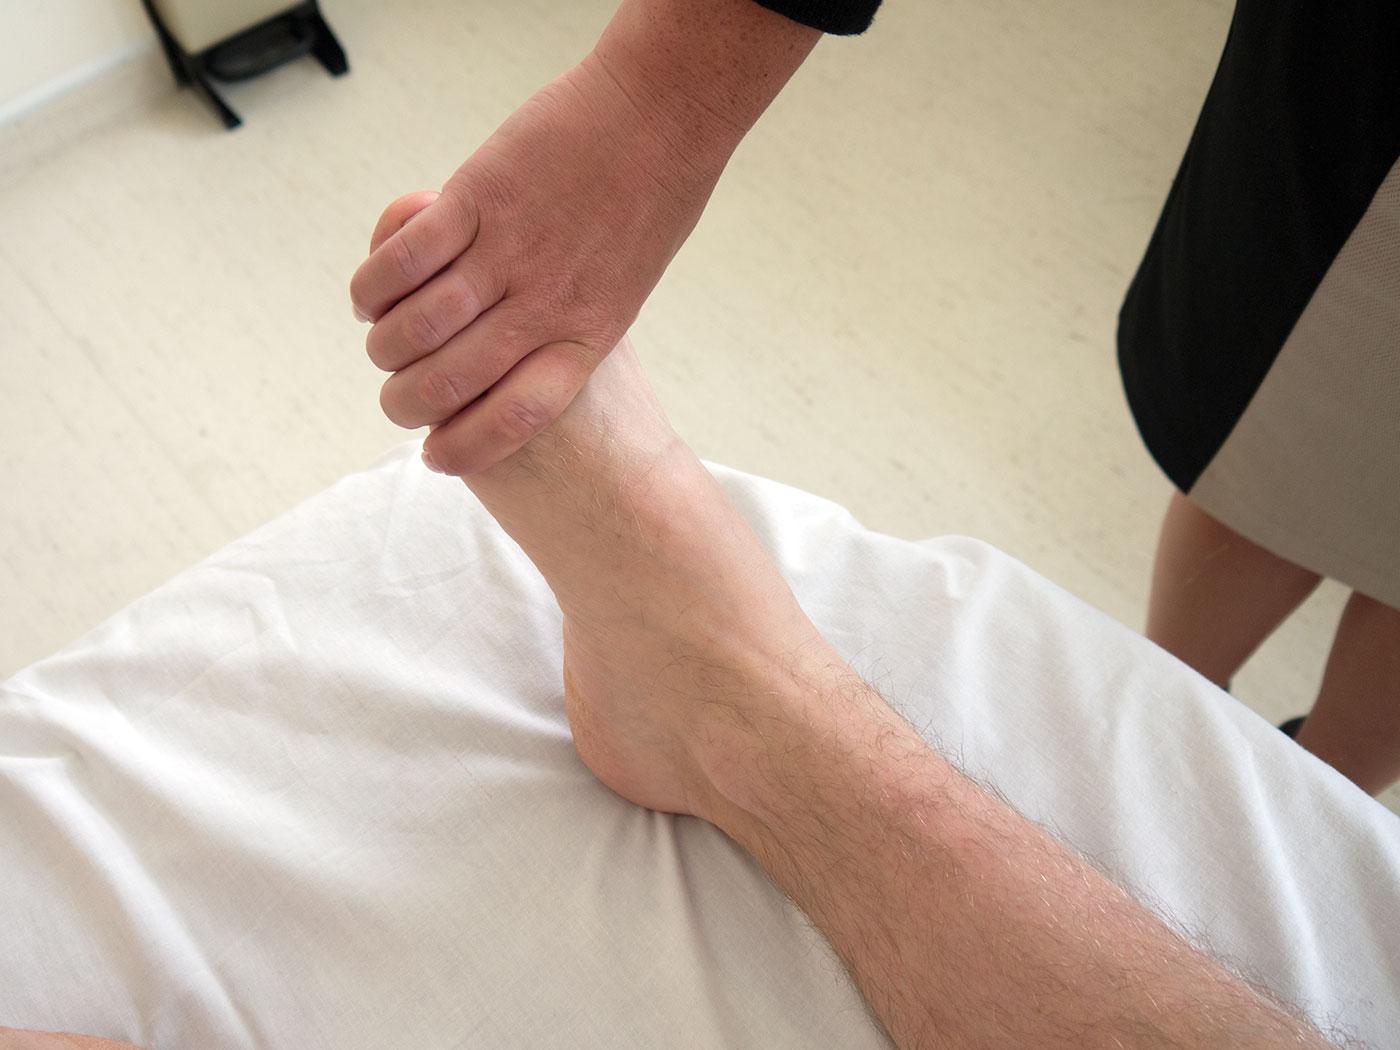 Squeeze the metatarsophalangeal joints